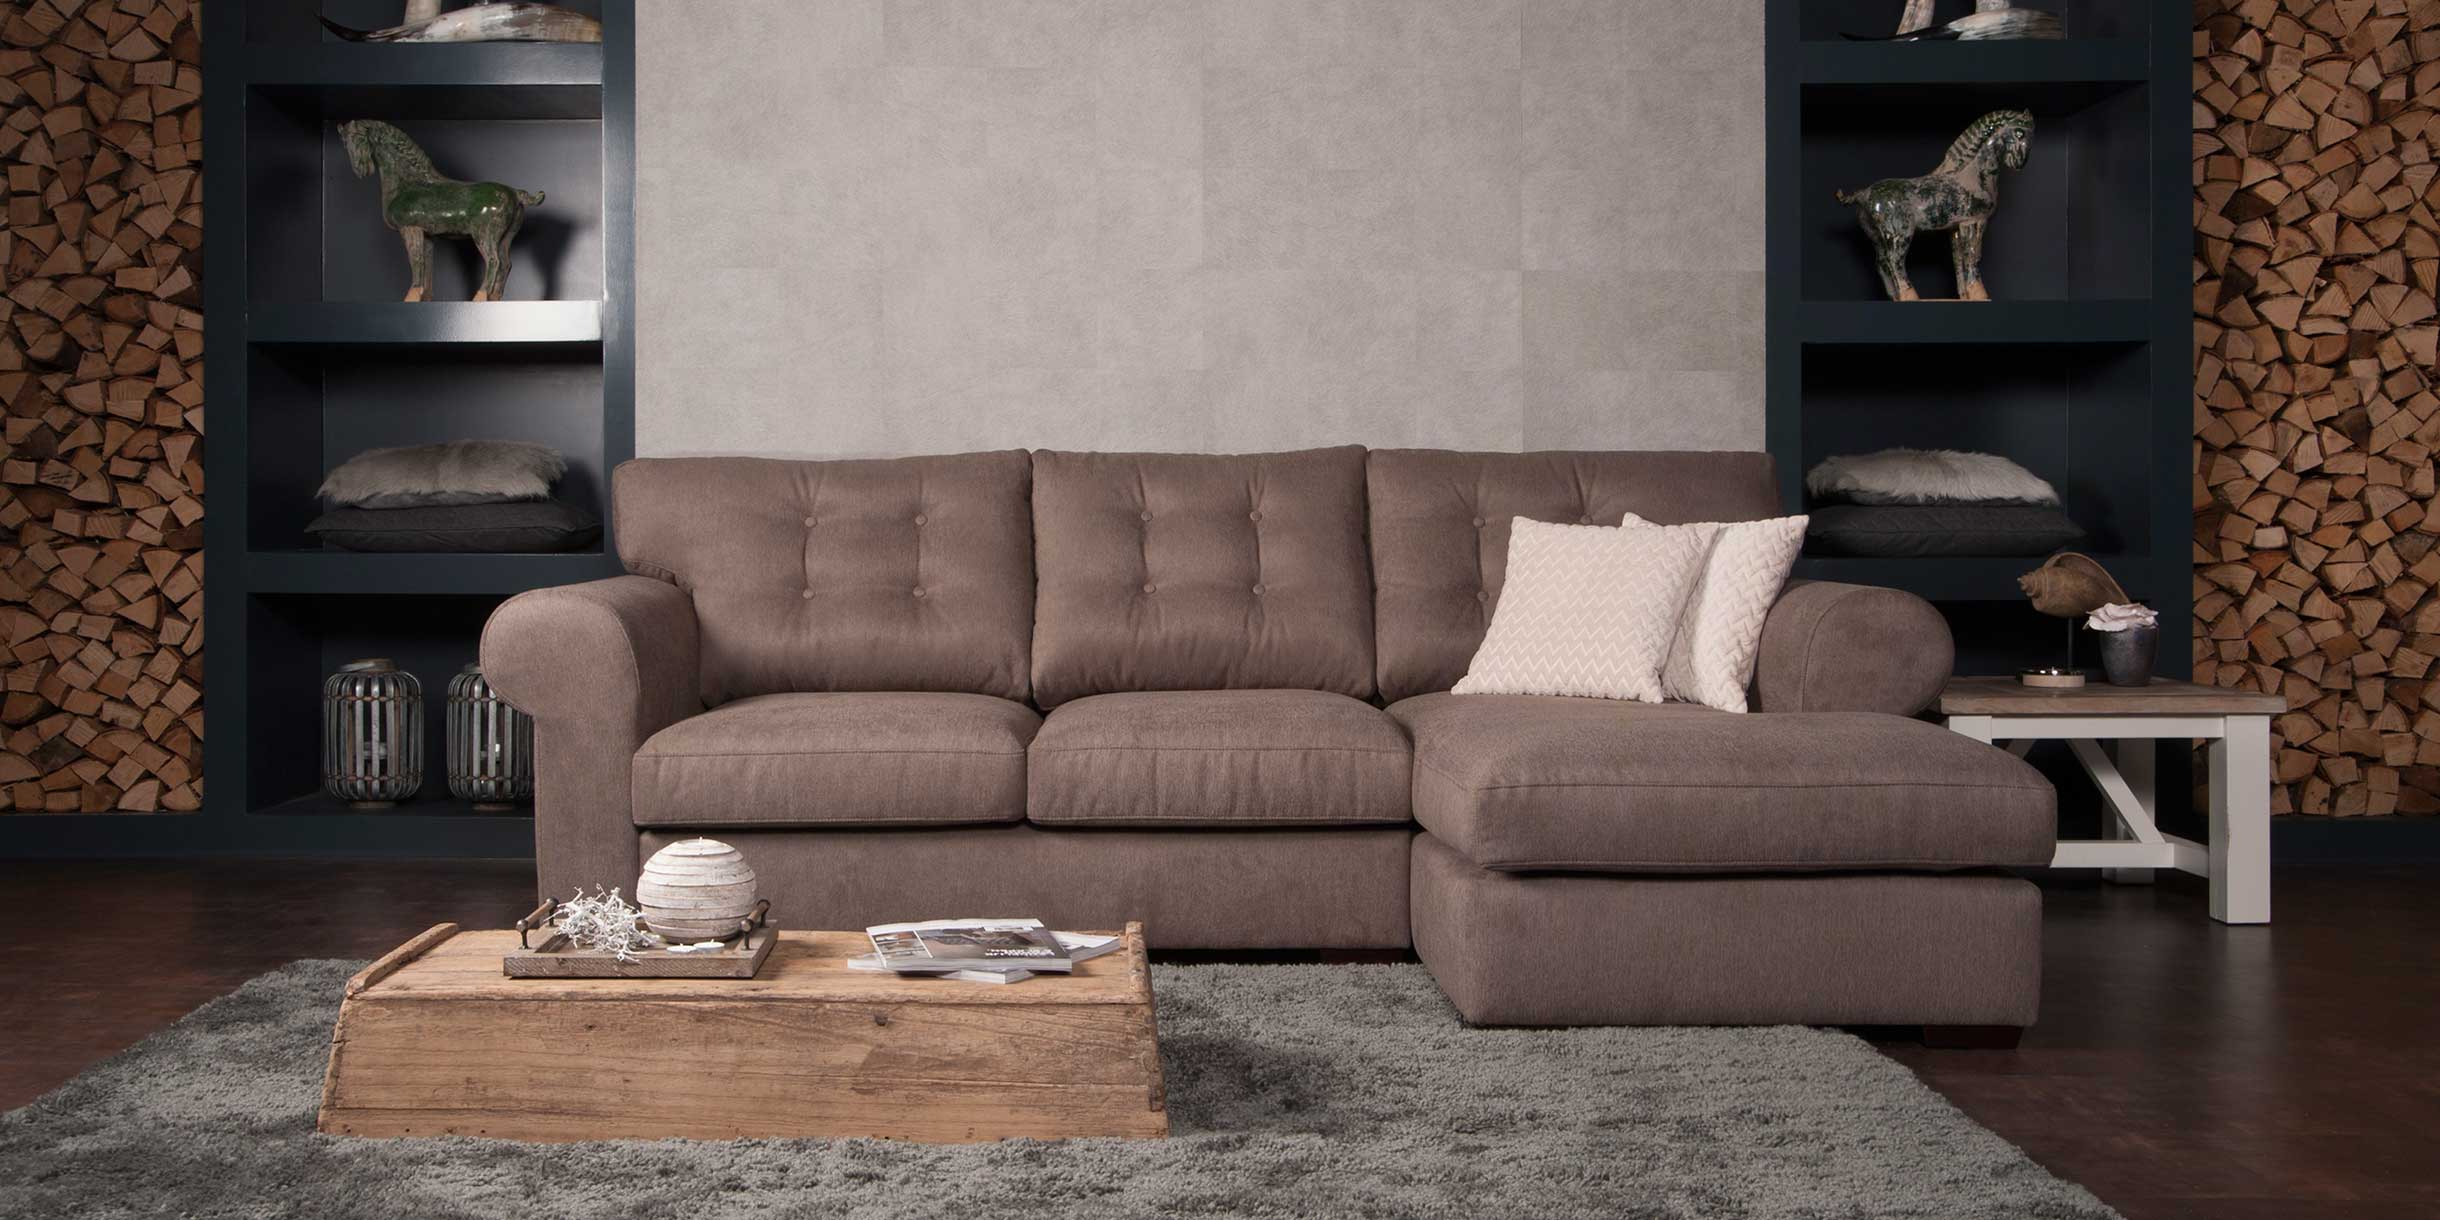 UrbanSofa-Merlin-Presto-lounge-met-sierkussens